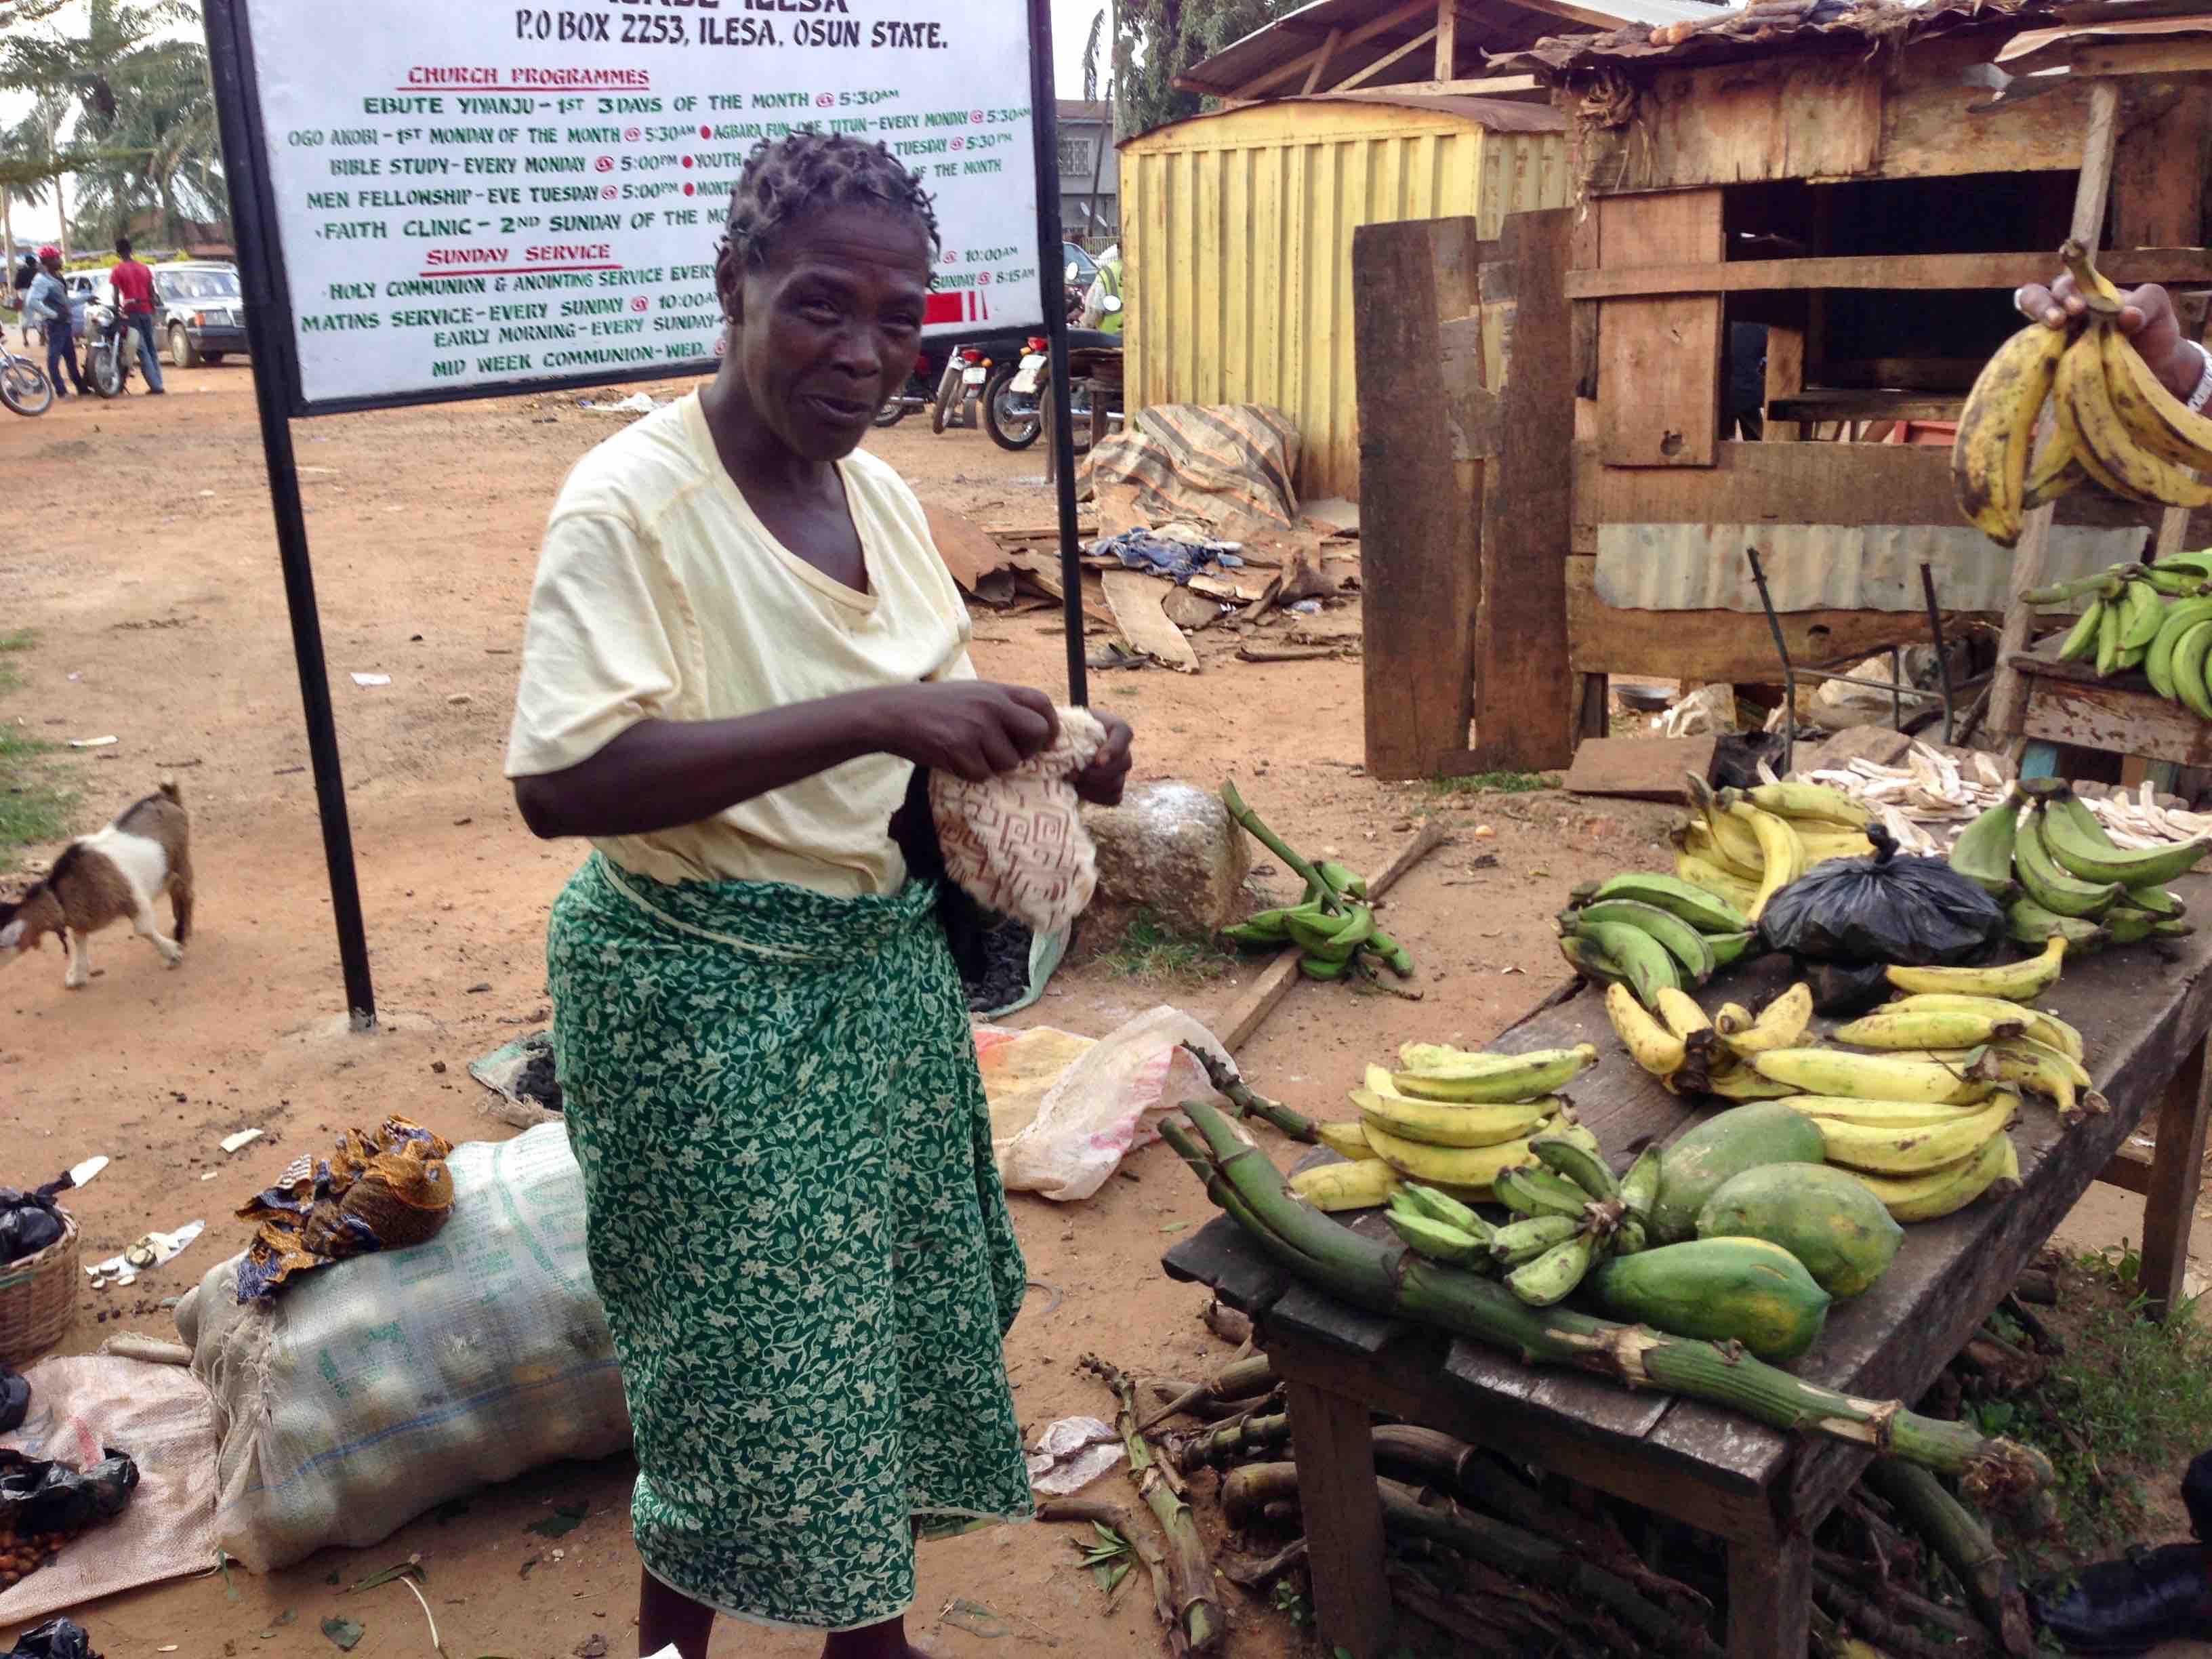 Ijesha woman selling plantains and pawpaw, Ilesa - Oshogbo Road, Oke Omiru, Ilesa, Osun State, Nigeria. #JujuFilms